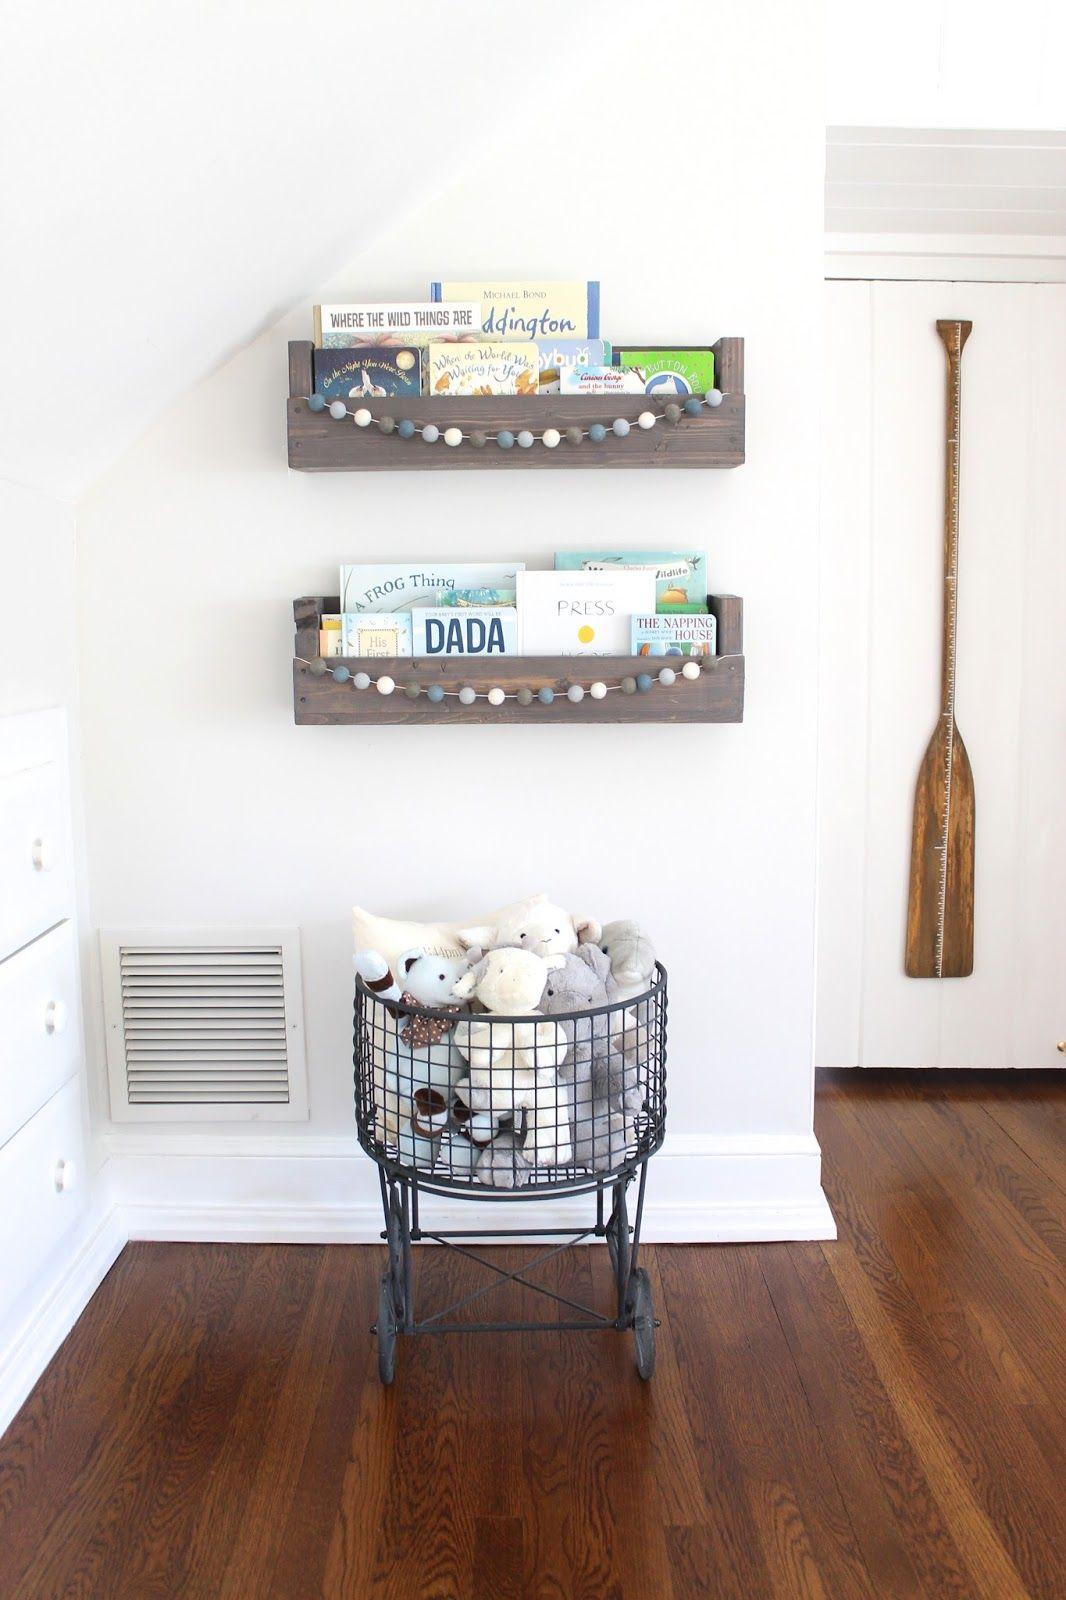 Nursery Bookshelf Concept With Cute And Playful Designs 954bartendinfo - Lieul-bookshelf-by-ahn-daekyung